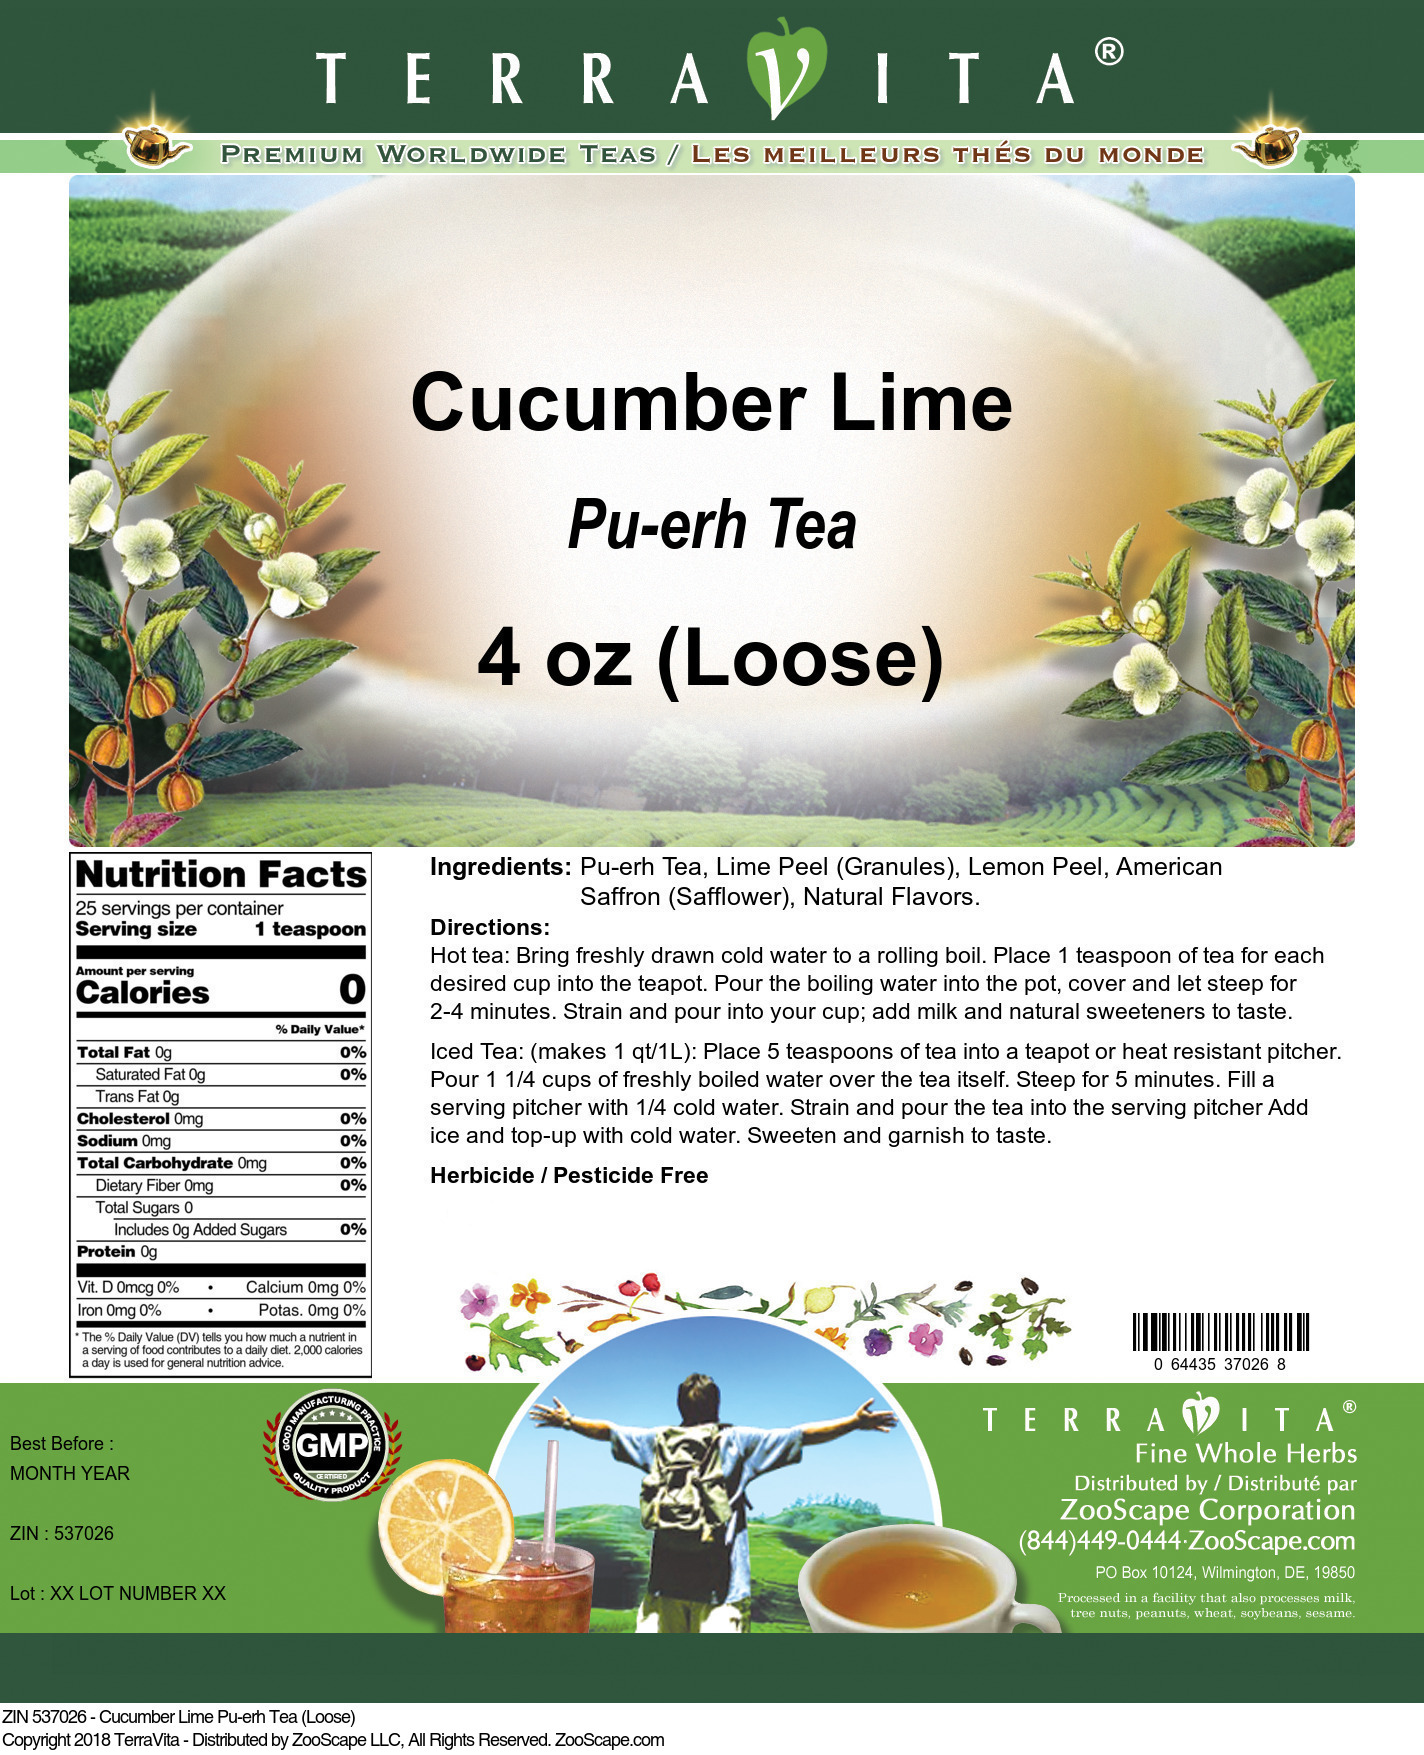 Cucumber Lime Pu-erh Tea